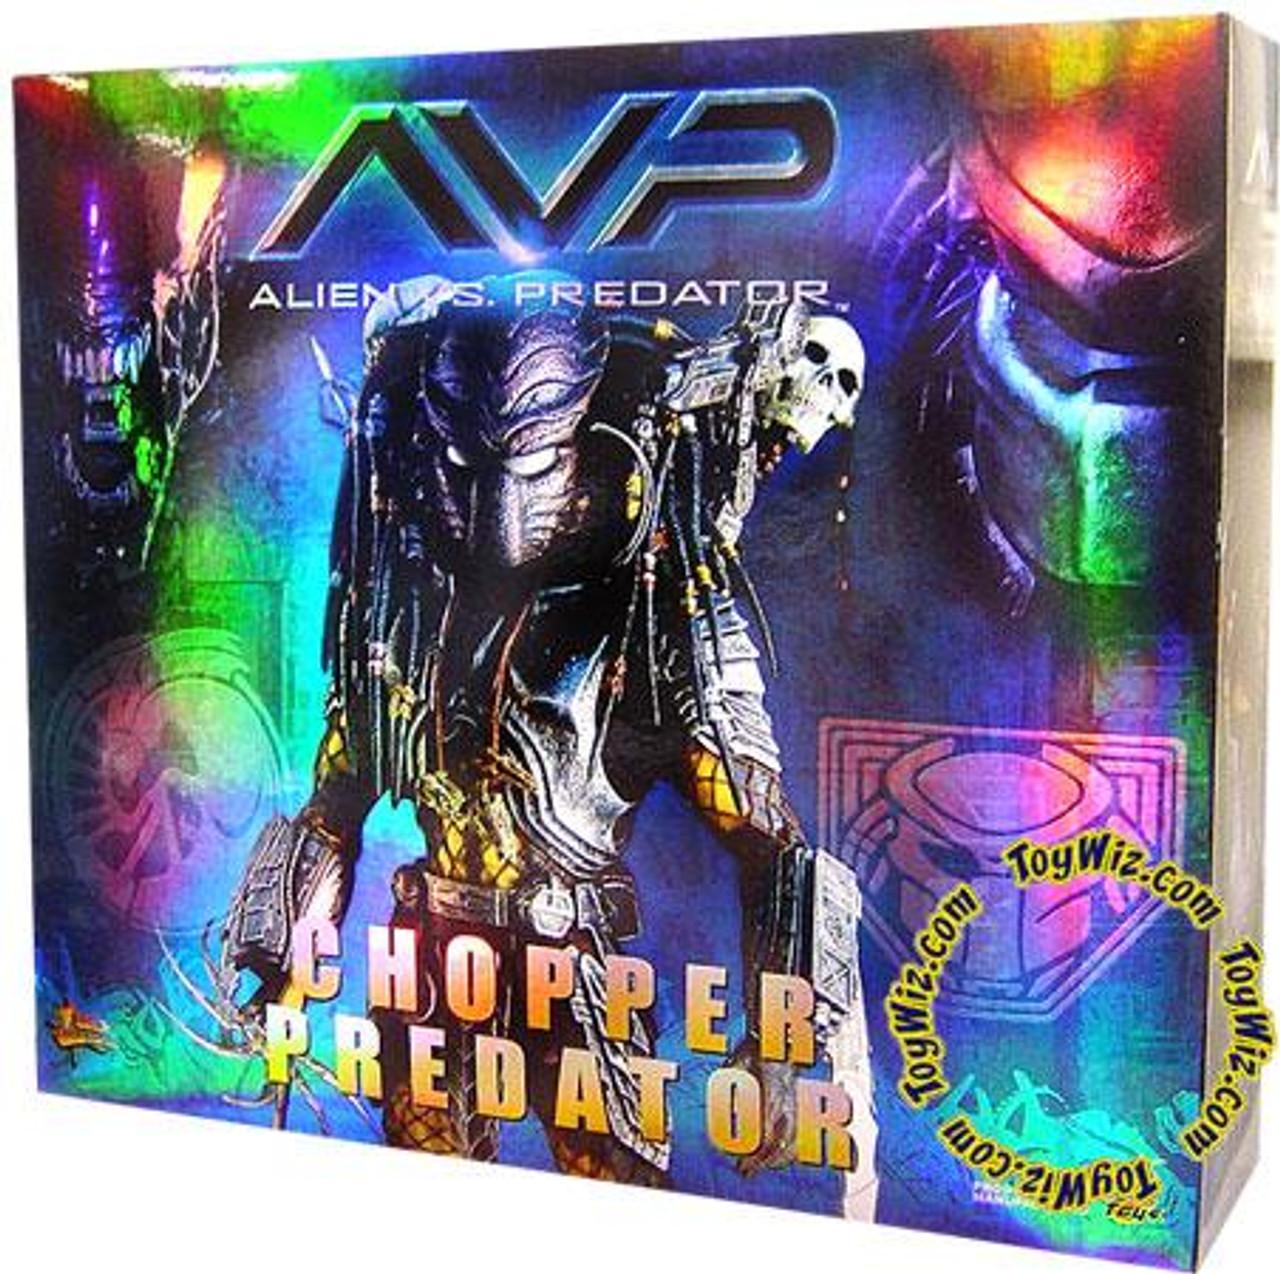 Alien vs Predator Movie Masterpiece Chopper Predator 1/6 Collectible Figure